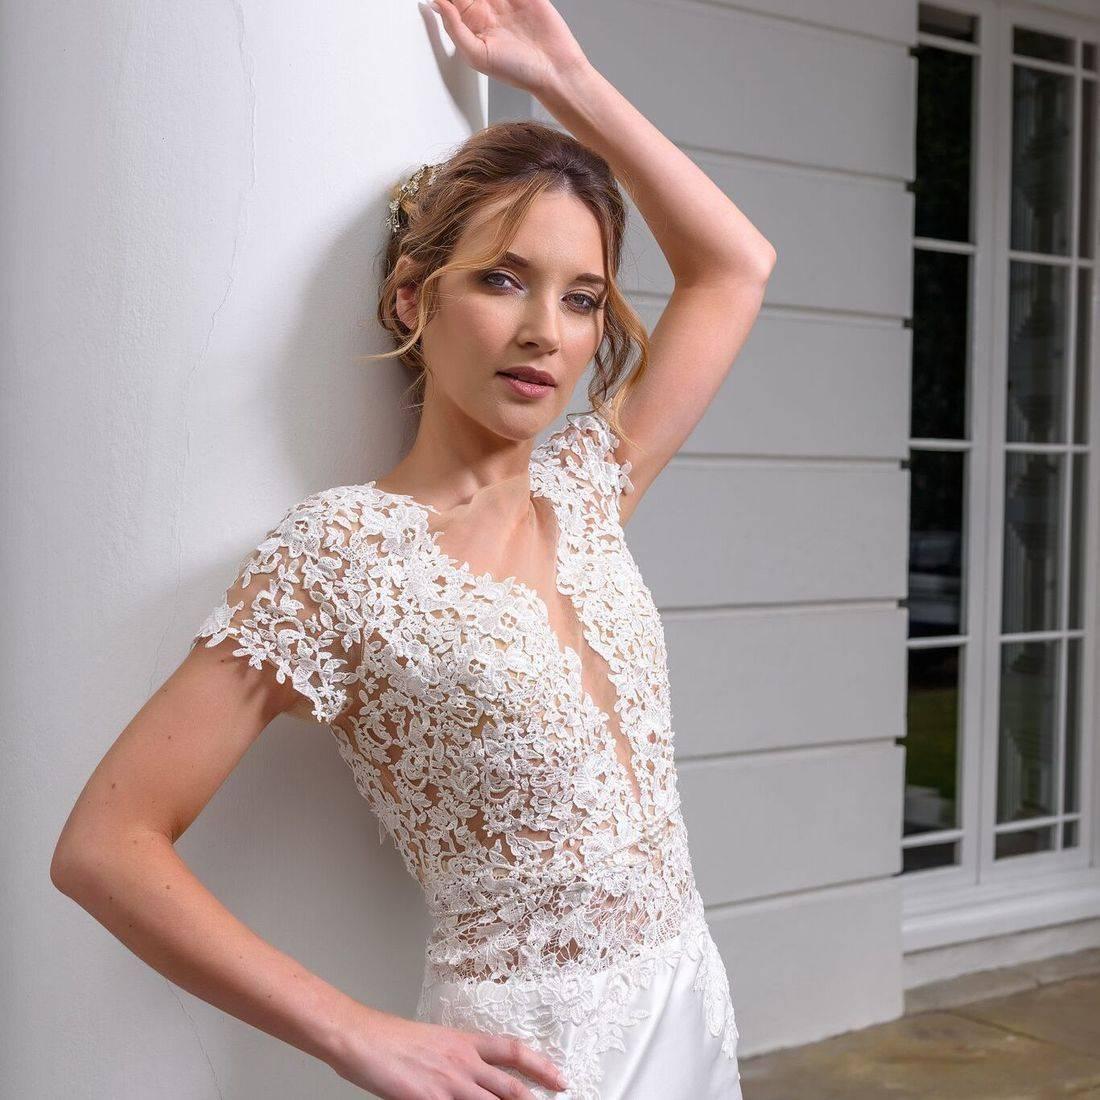 mori lee, lace wedding dress, illusion wedding dress, dipped neckline wedding dress, dipped back wedding dress, wedding dress with sleeve, wedding dress with short sleeve